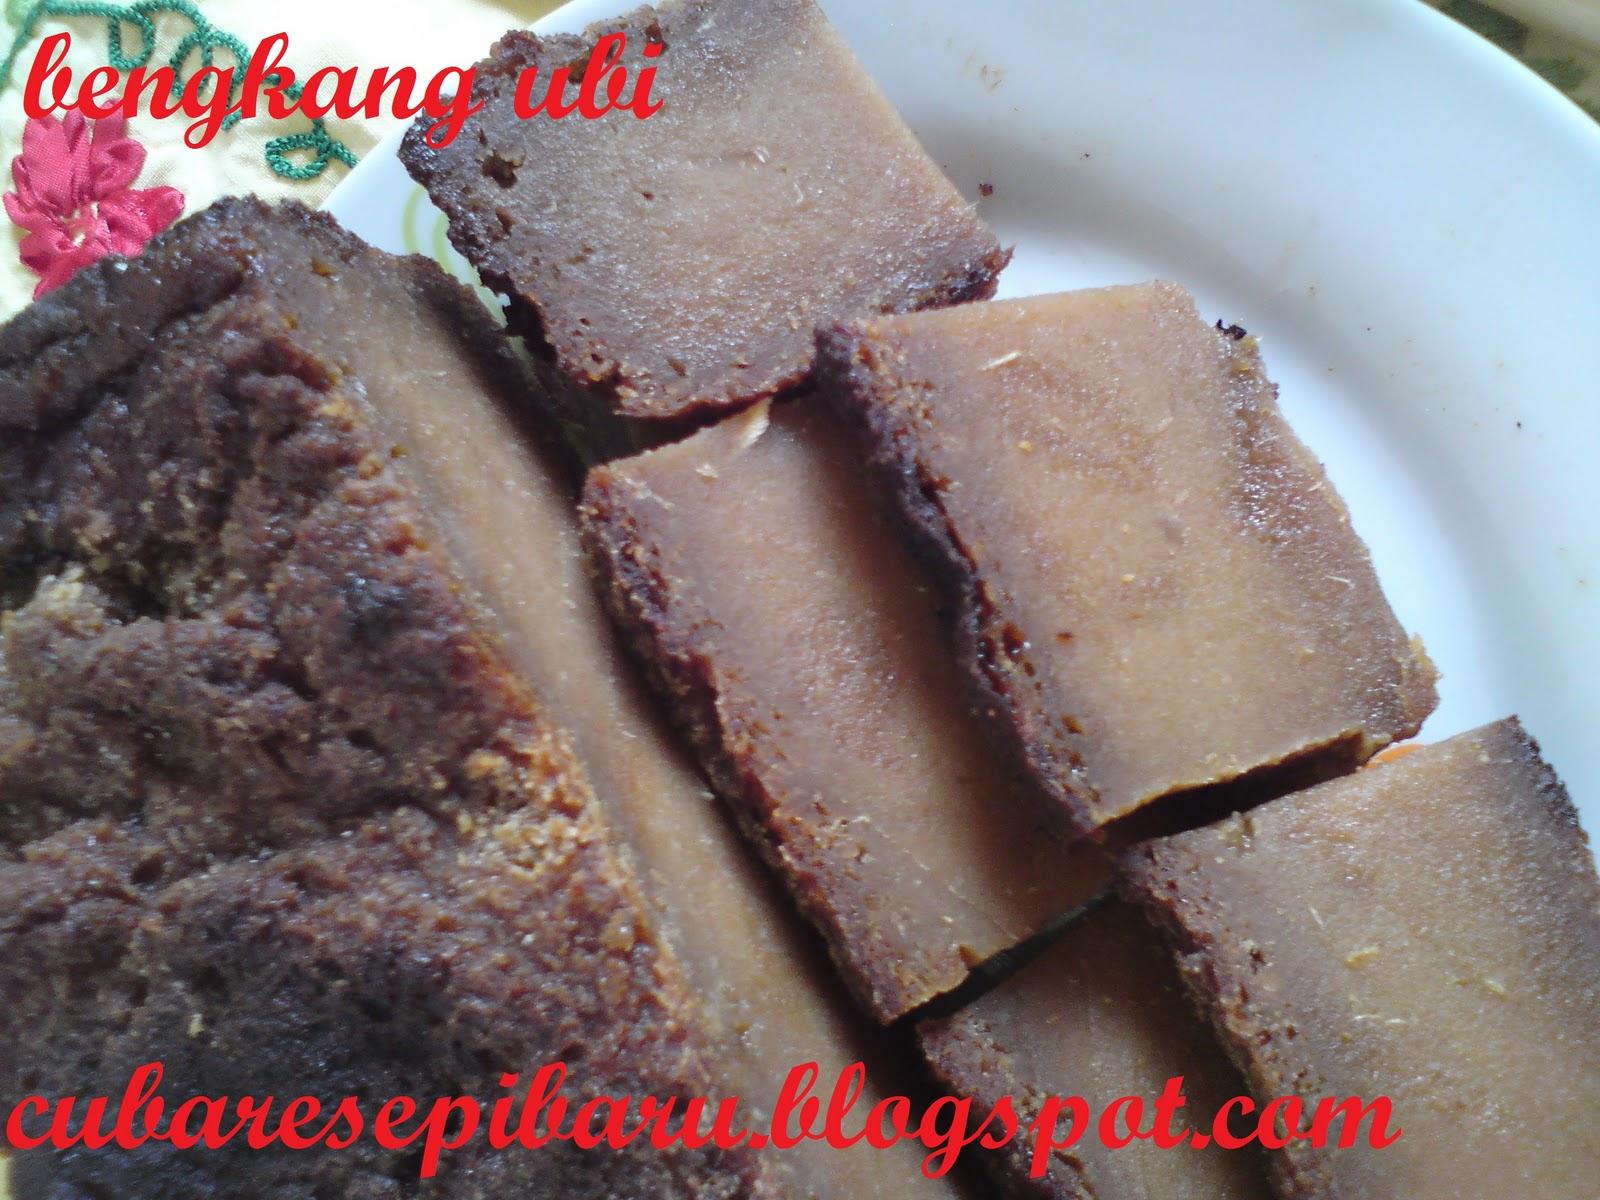 bingka ubi kayu gula merah makanan khas indonesia getuk gula merah  yani cakes  rimsdarr Resepi Kuih Bingka Gula Merah Enak dan Mudah